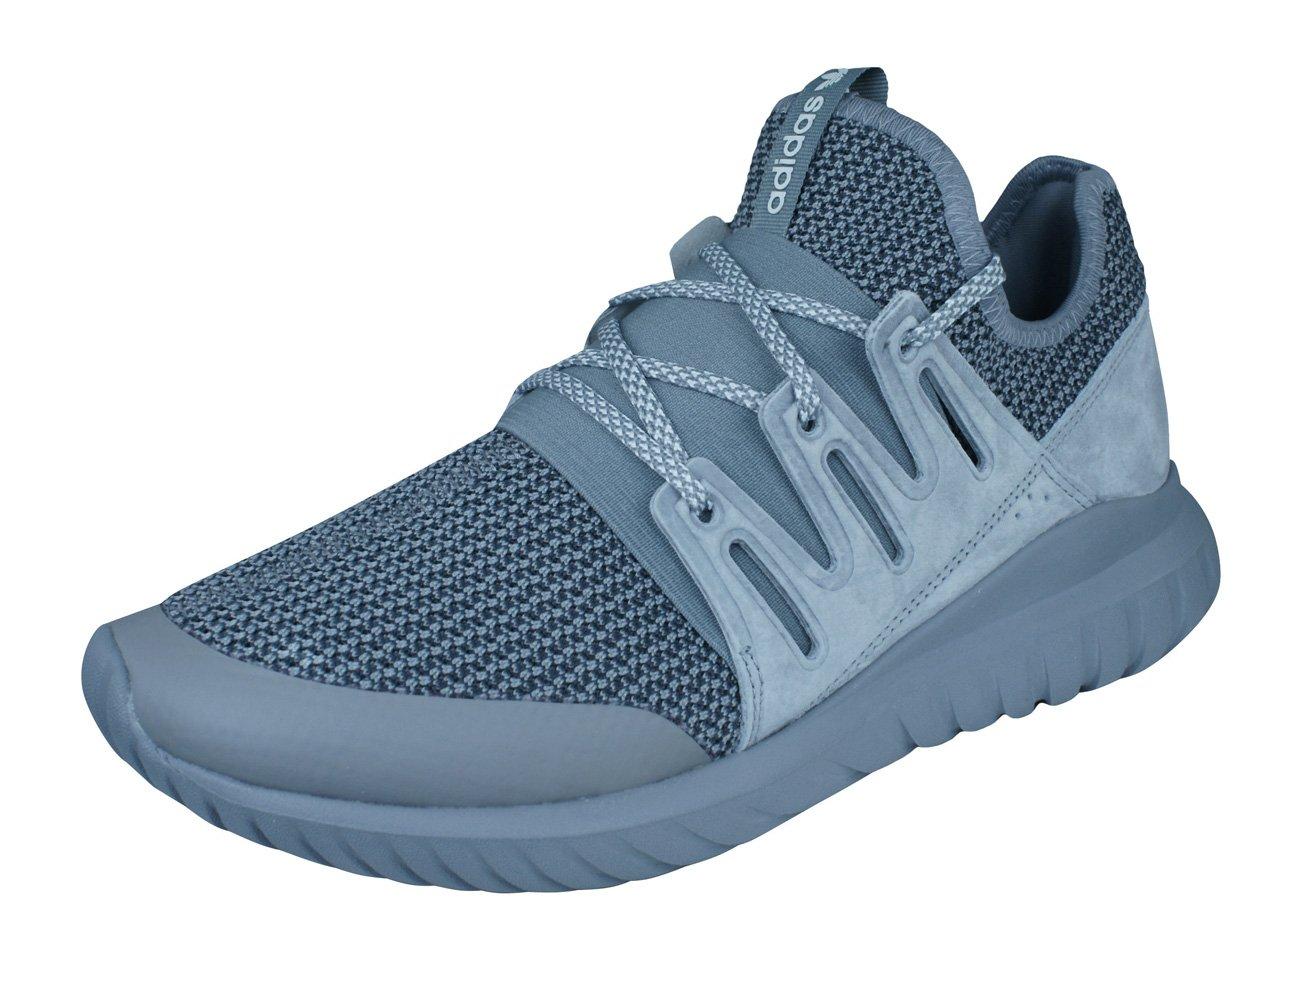 Adidas da Uomo Tubular Radial S76718 Sneaker